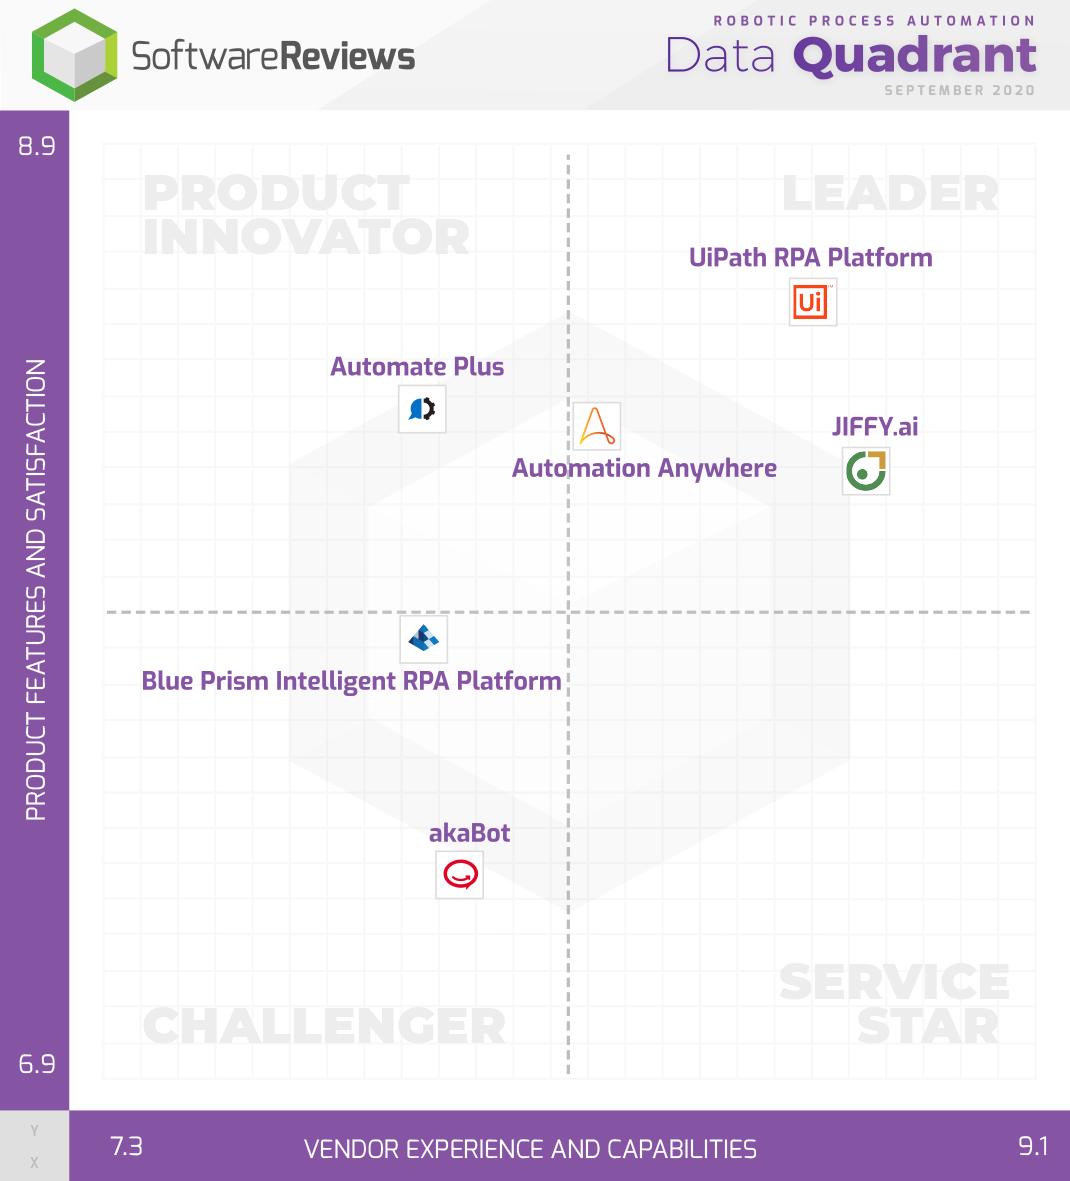 Robotic Process Automation Data Quadrant